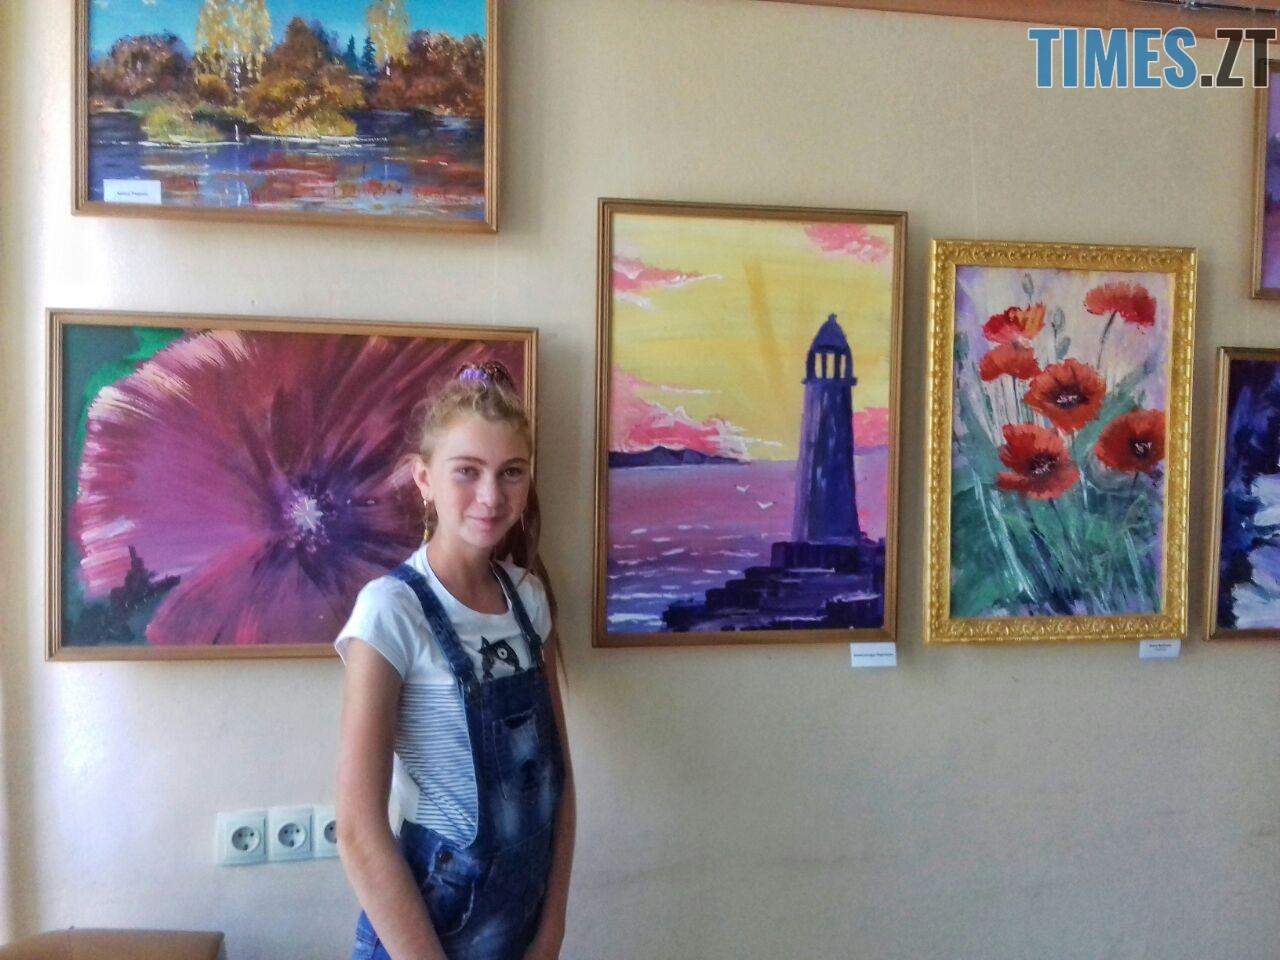 WhatsApp Image 2018 09 01 at 12.12.51 - Мистецтво нашвидкуруч: митець показав, як намалювати картину за 20 хвилин (ФОТО)